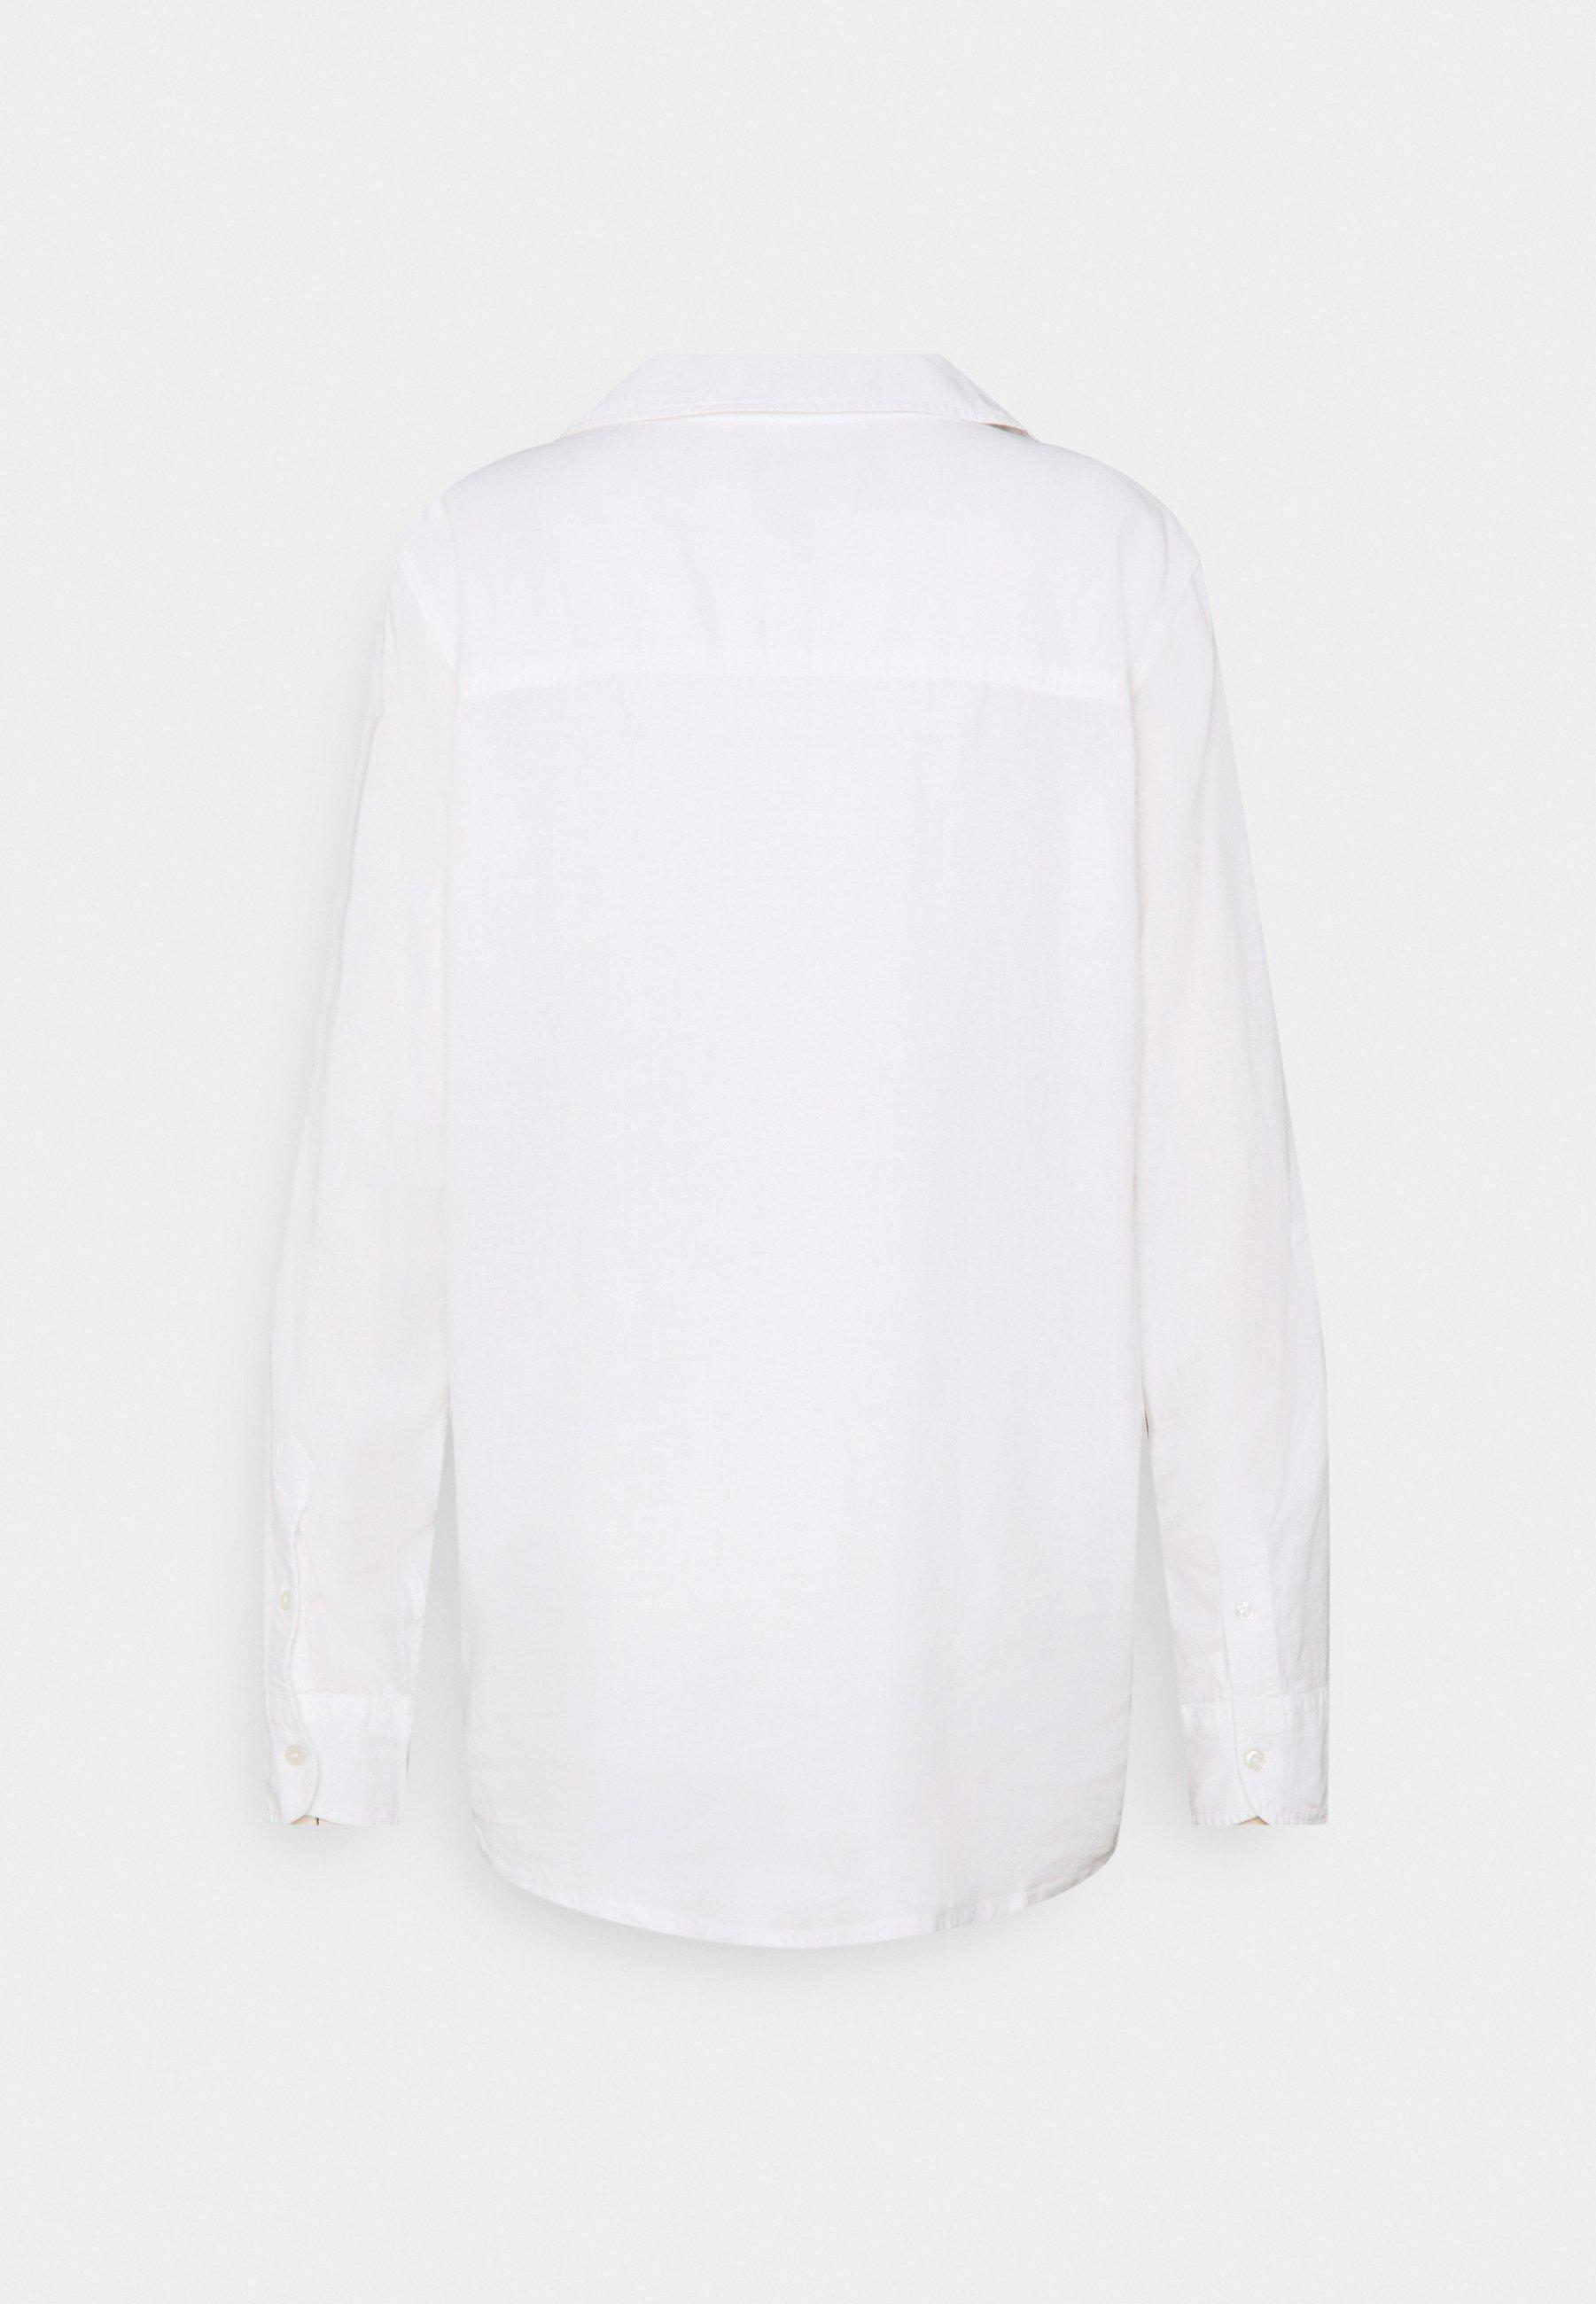 Abercrombie & Fitch Skjorte white Zalando.no